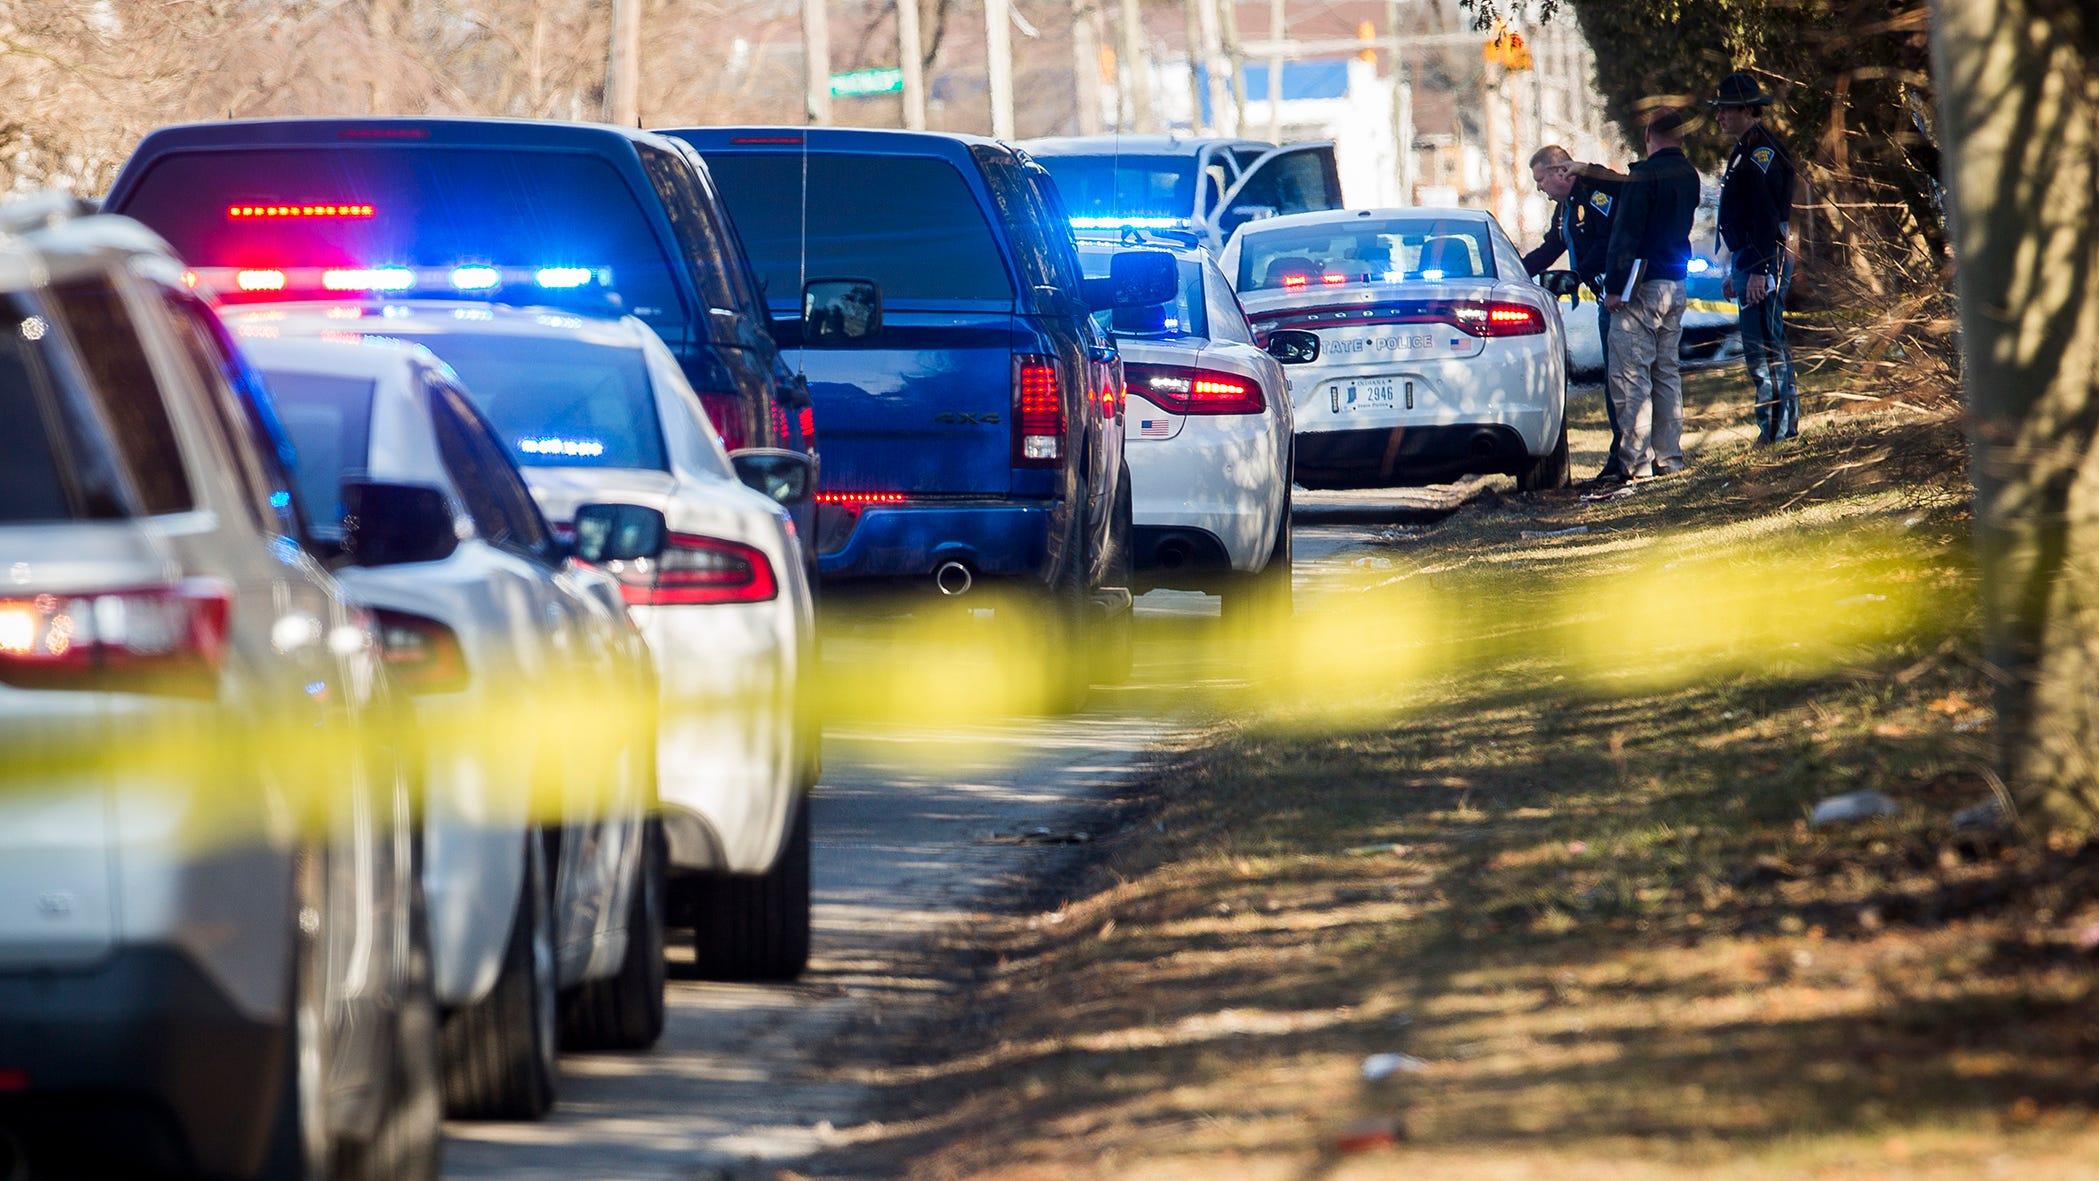 Prosecutor: Fatal police action shooting in Muncie justified